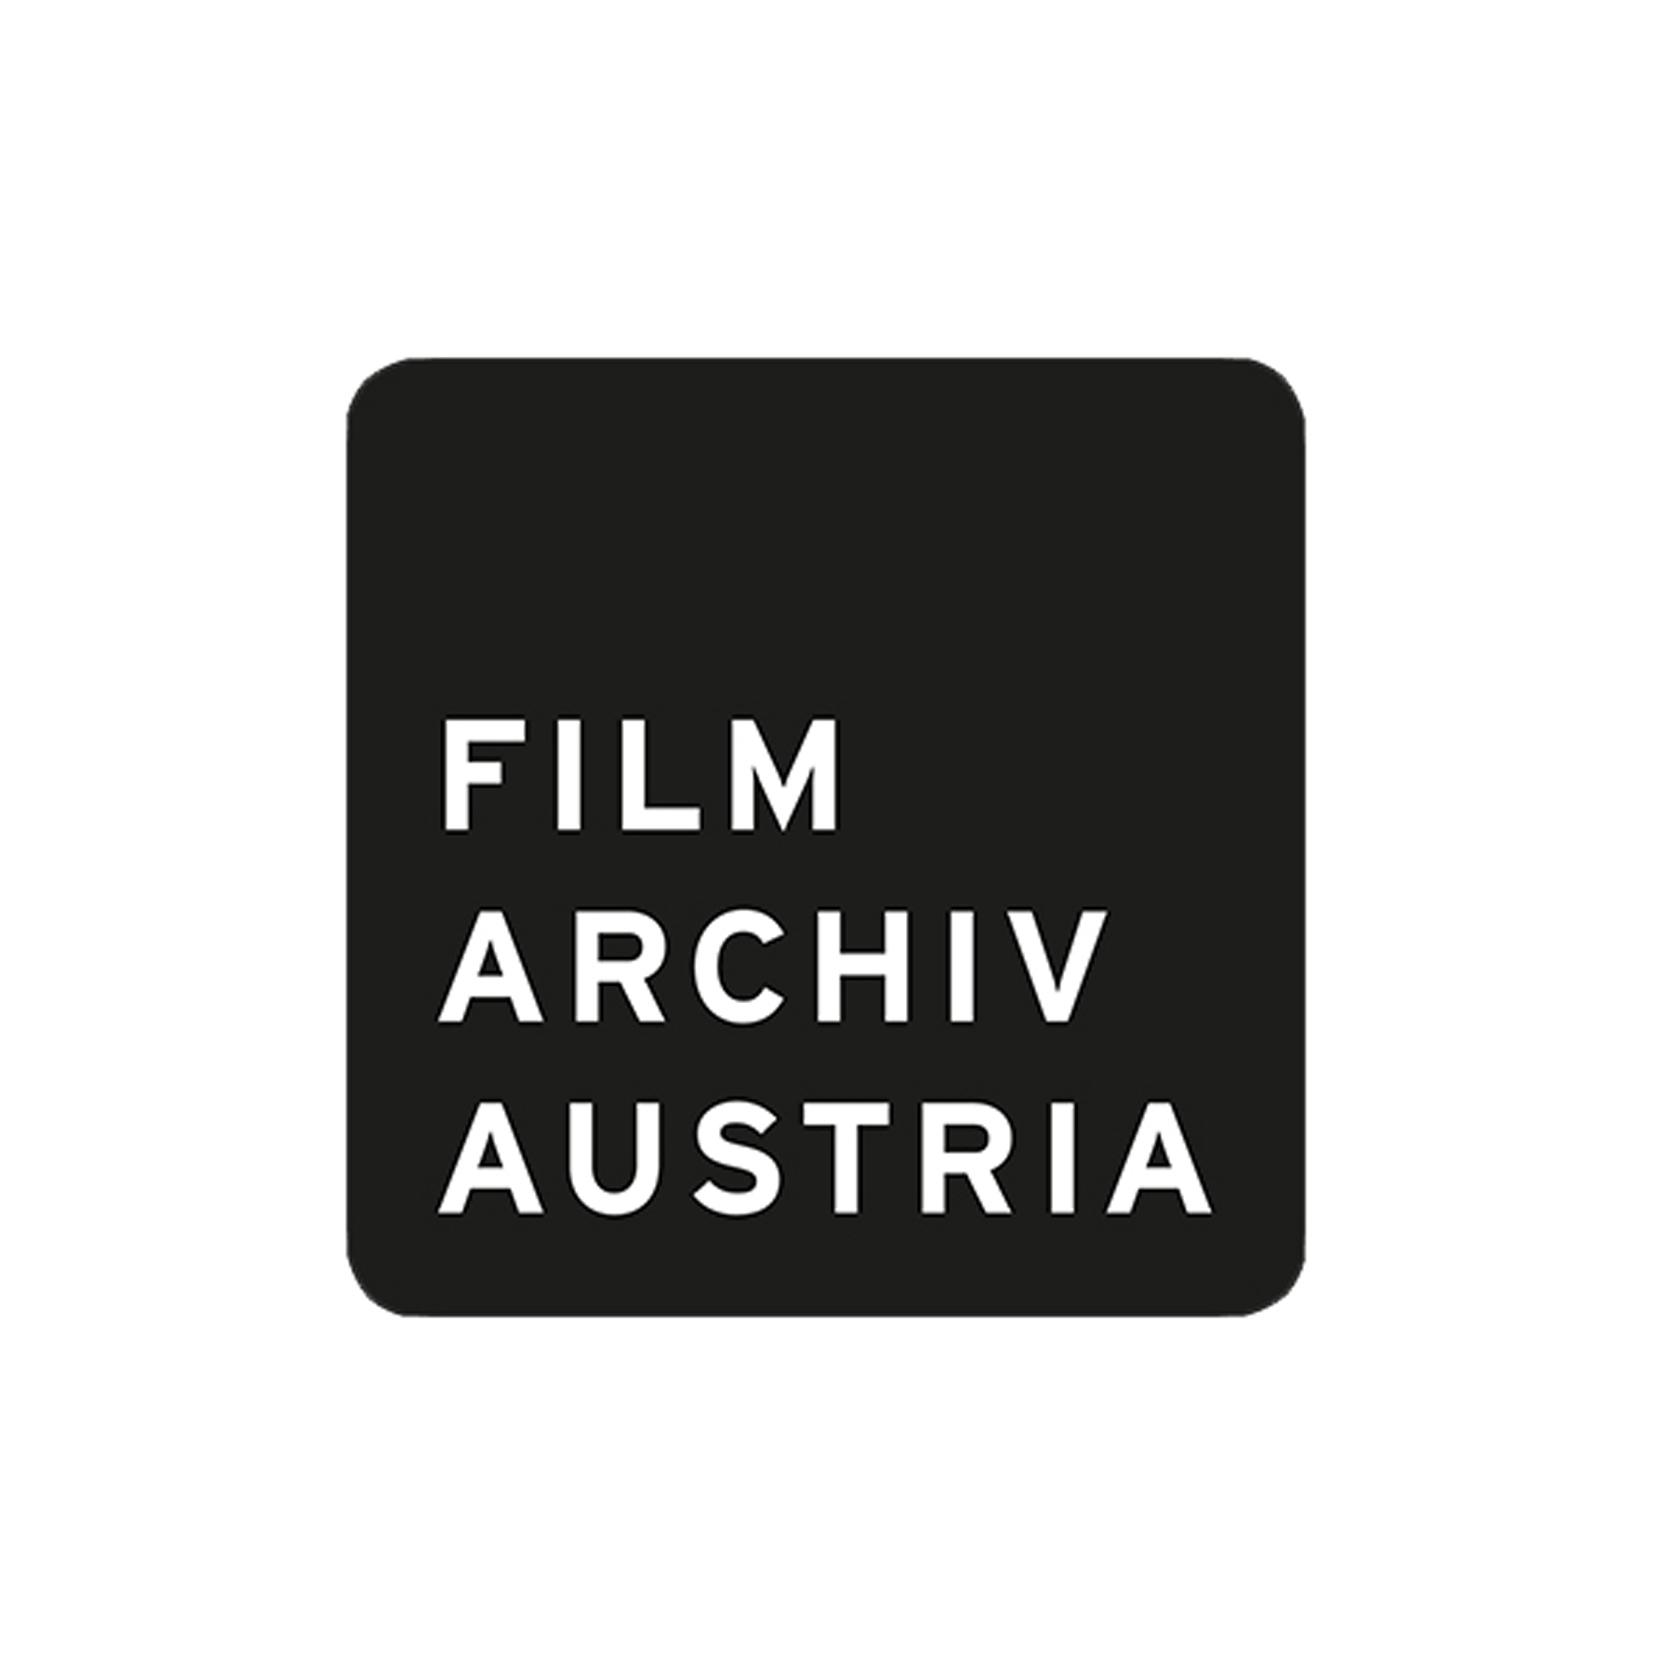 Filmarchiv austria logo web